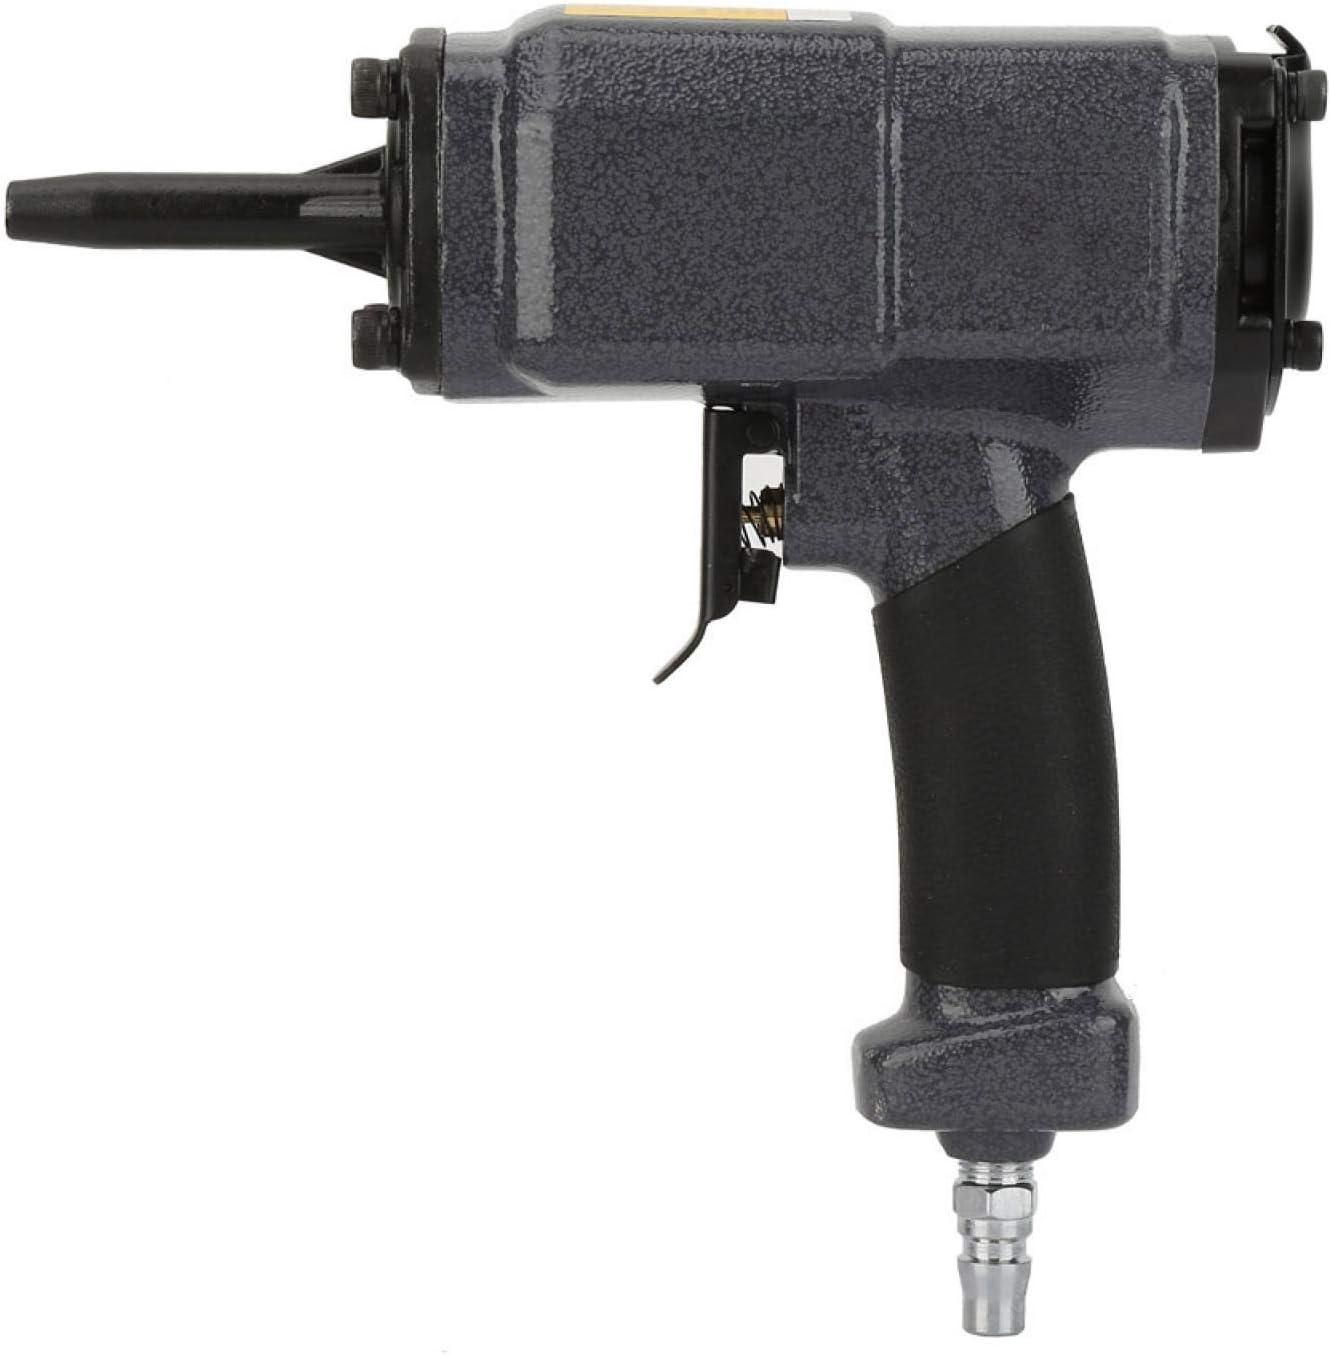 Ginorgee Pistola de extracción de Clavos - NP-50 Pistola de extracción de Clavos Extractor de Clavos neumático Stubbs Extractor de Clavos Pistolas eléctricas Pistola Grapadora de Aire